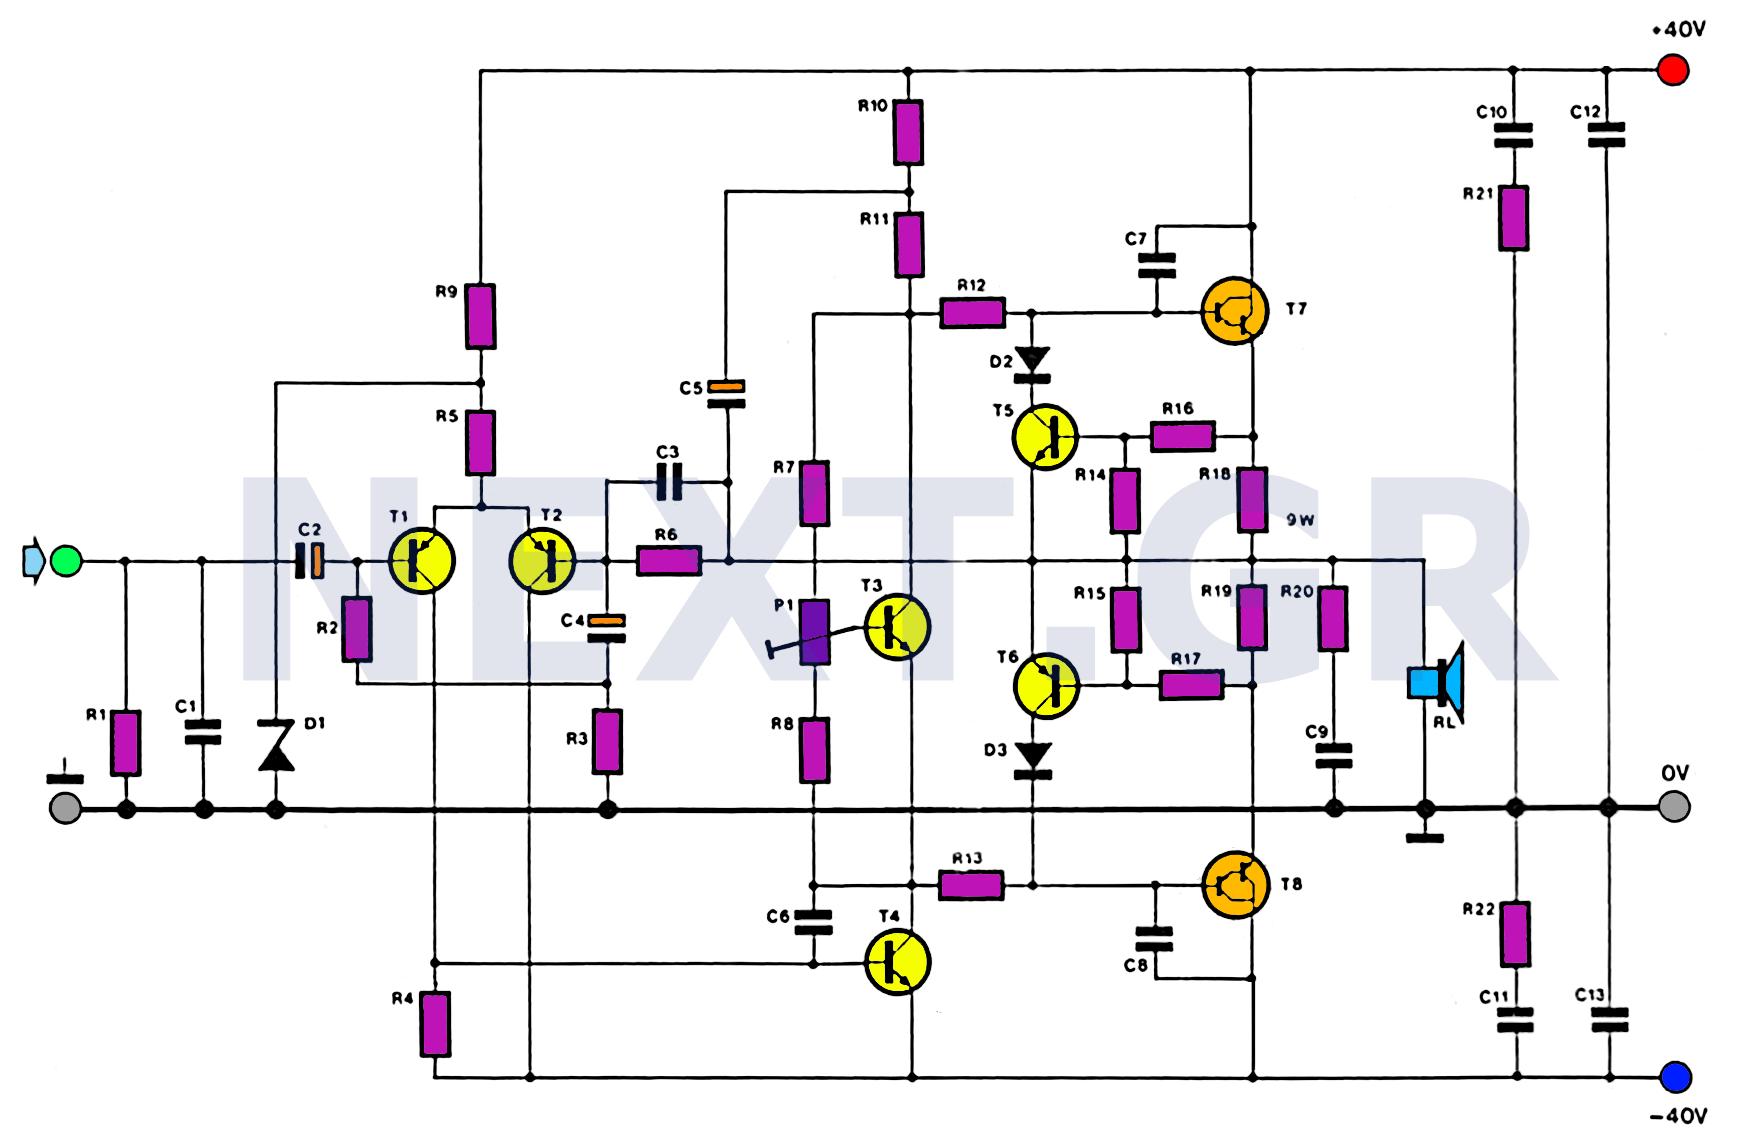 100w subwoofer amplifier circuit diagram afc neo wiring sr20det audio circuits next gr